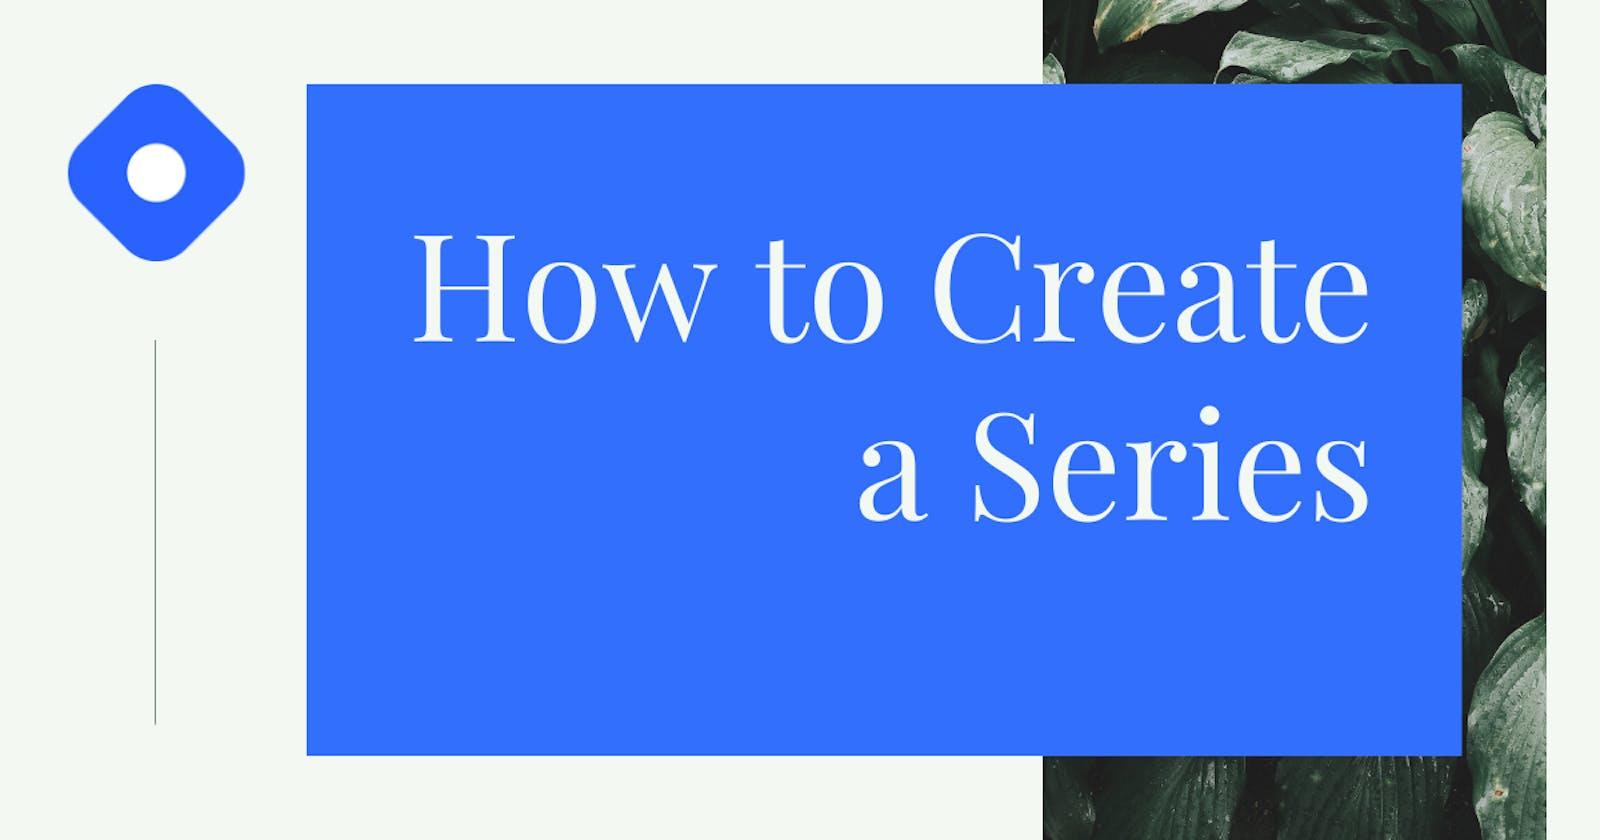 How to create a series on Hashnode